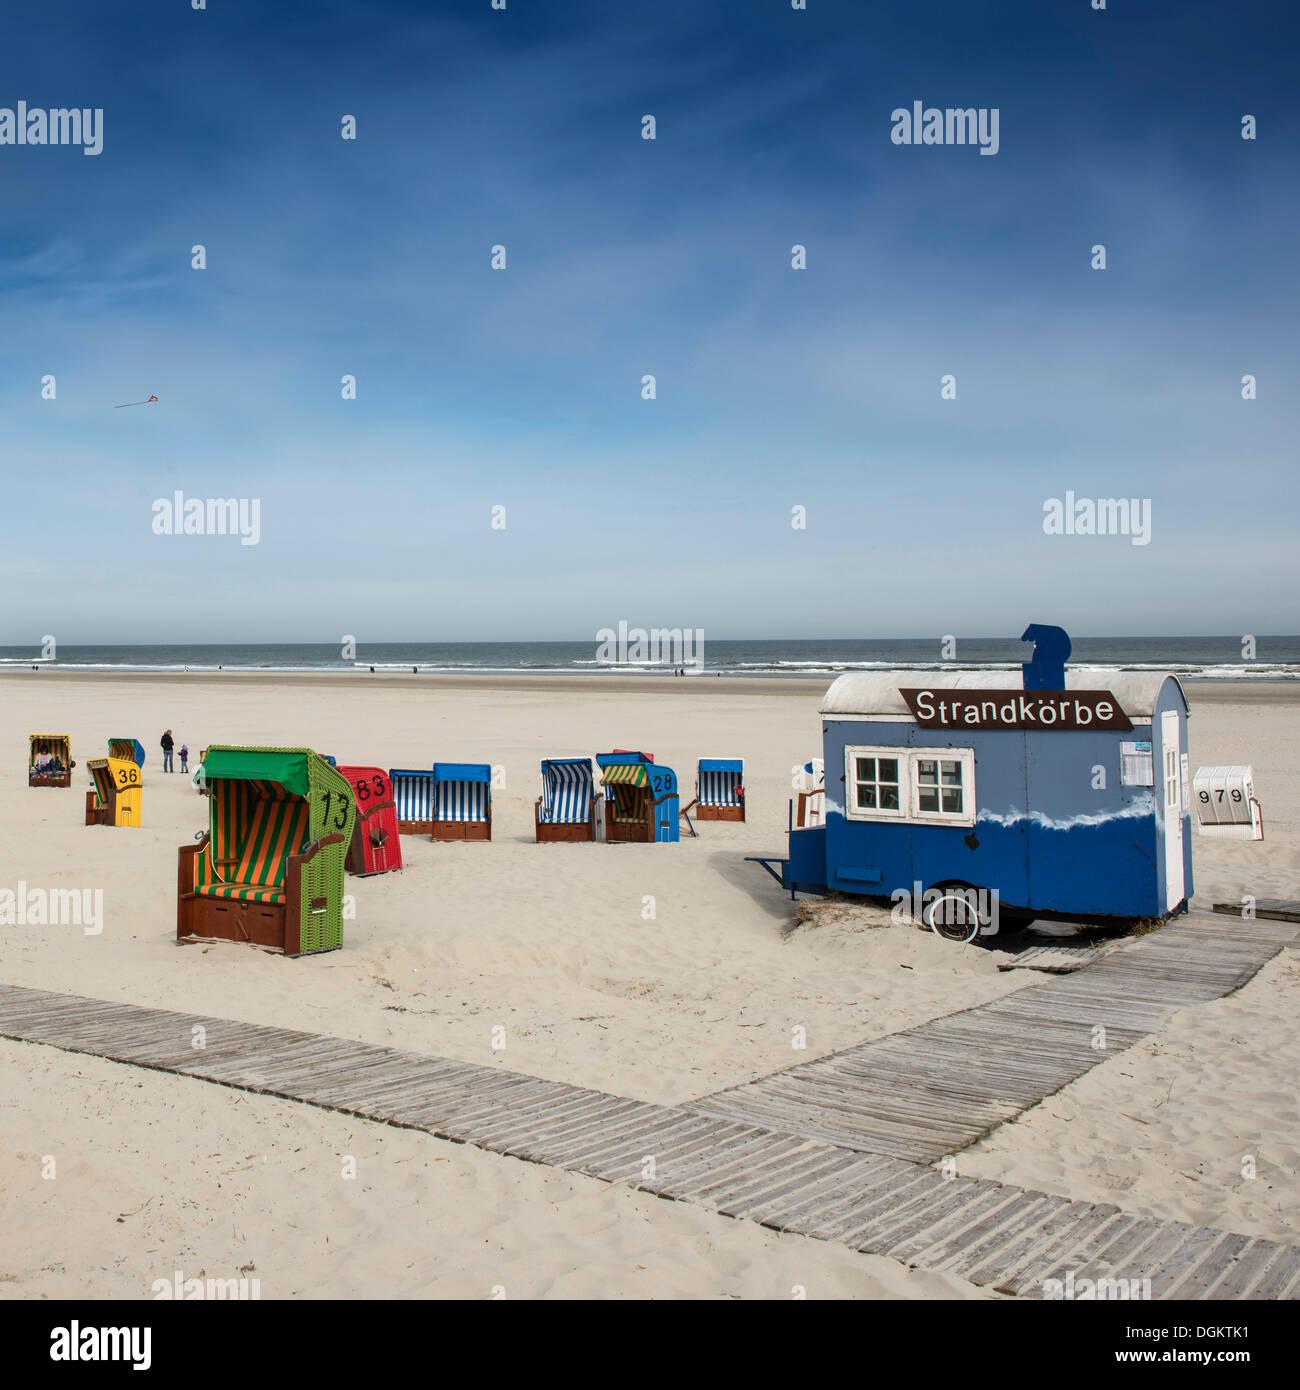 Roofed wicker beach chair rental on the beach, Juist island, North Sea, Lower Saxony - Stock Image